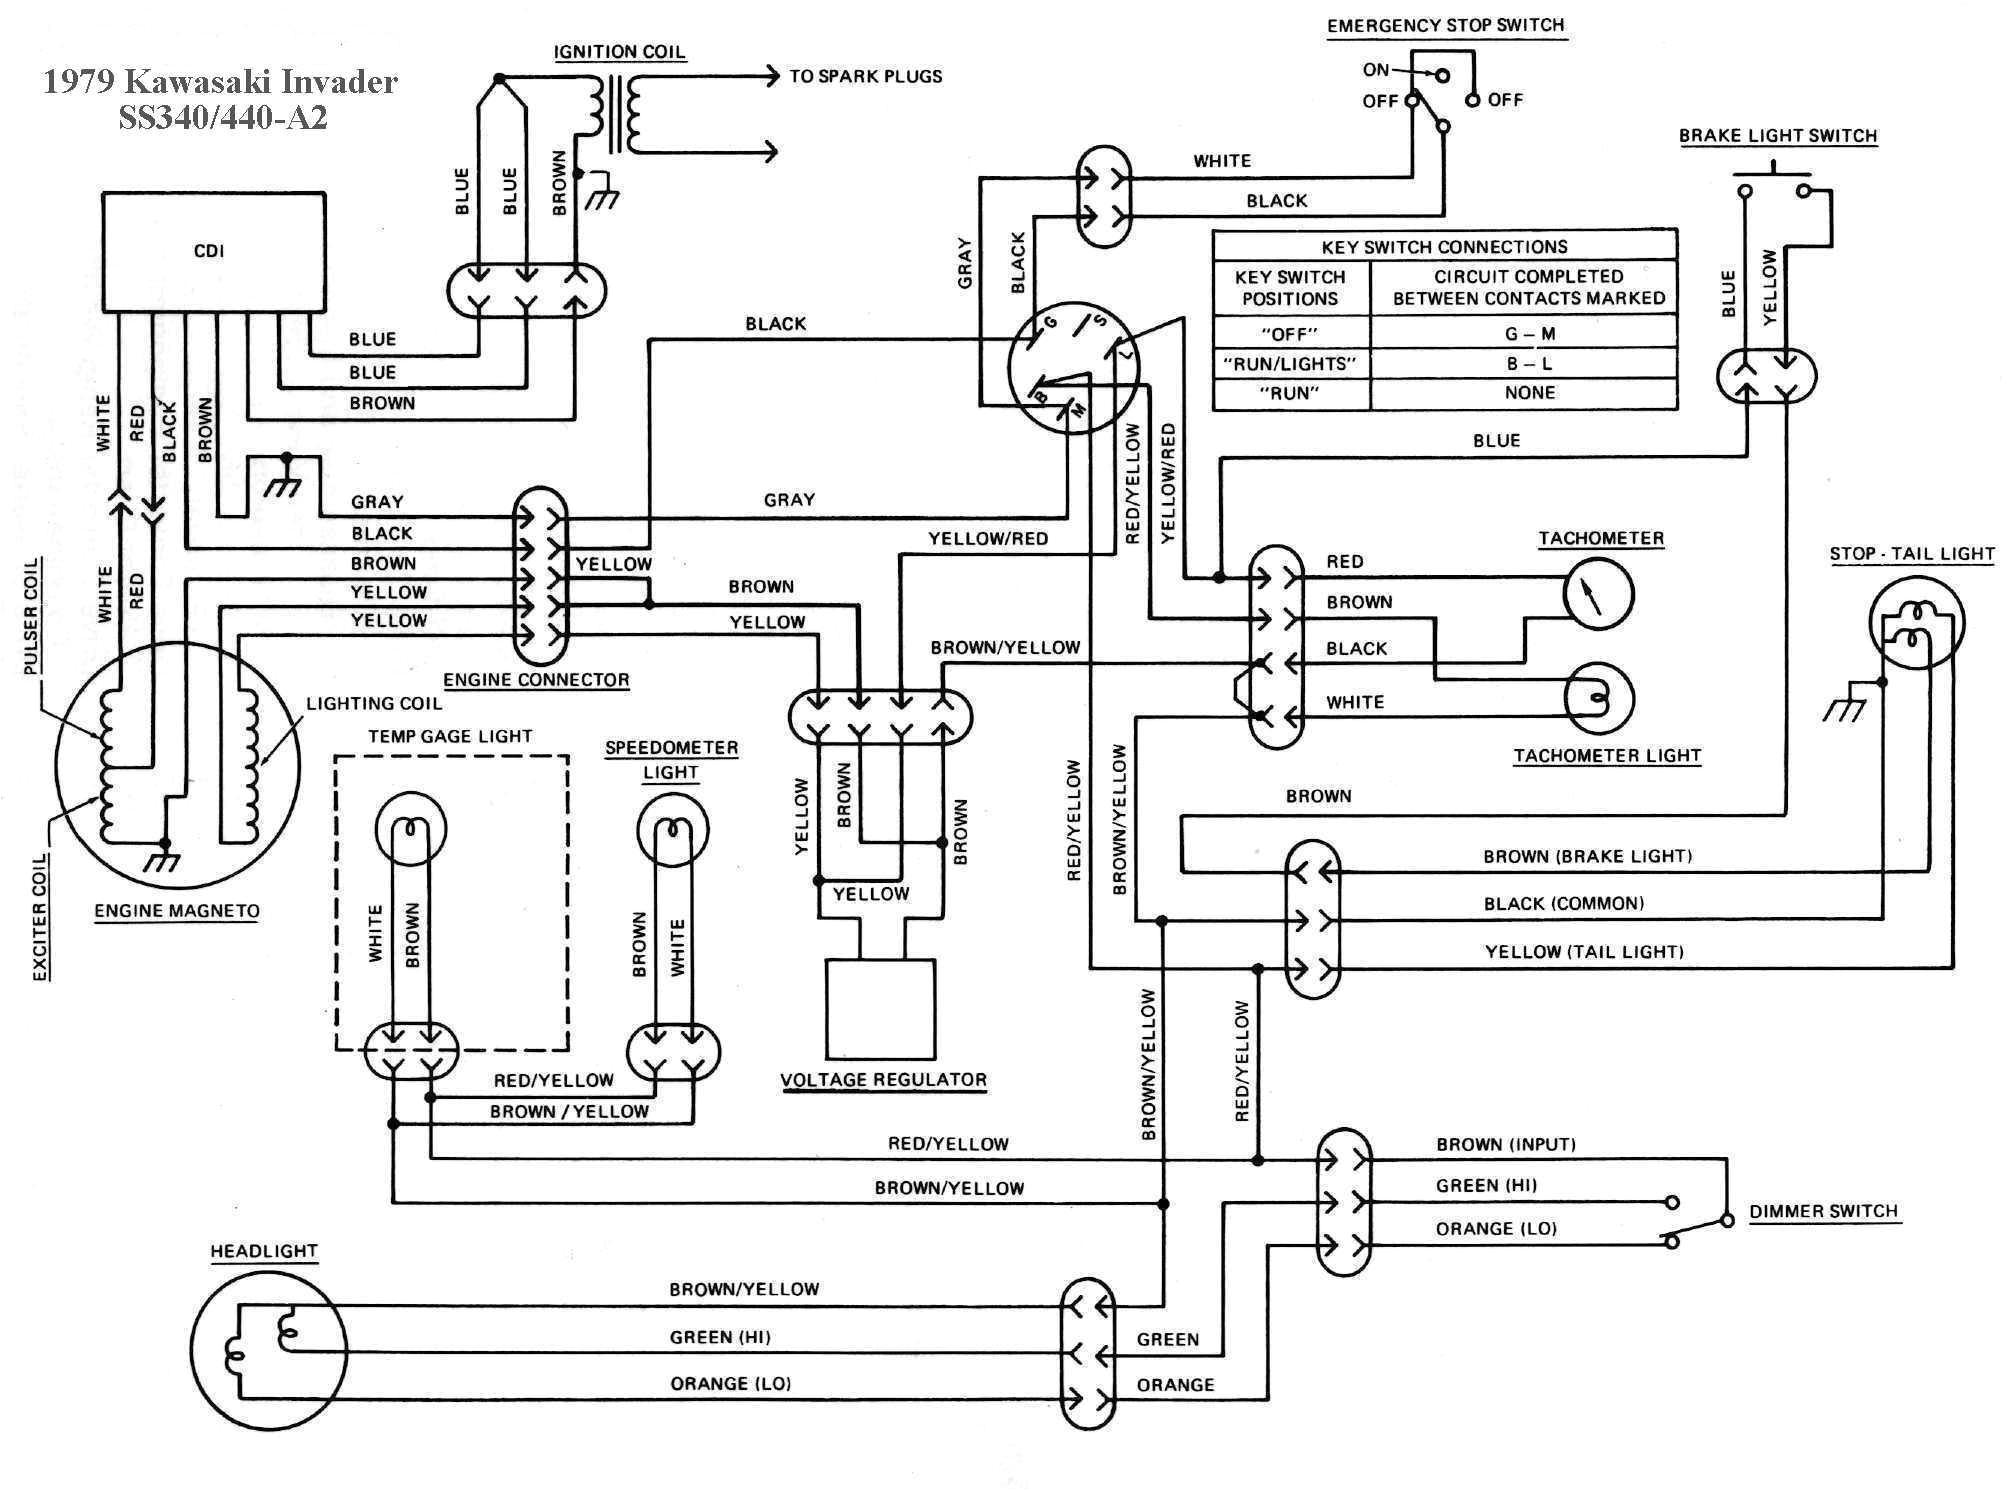 kawasaki bayou 220 wiring harness wiring diagram showkawasaki bayou 220 wiring wiring diagrams favorites 2001 kawasaki